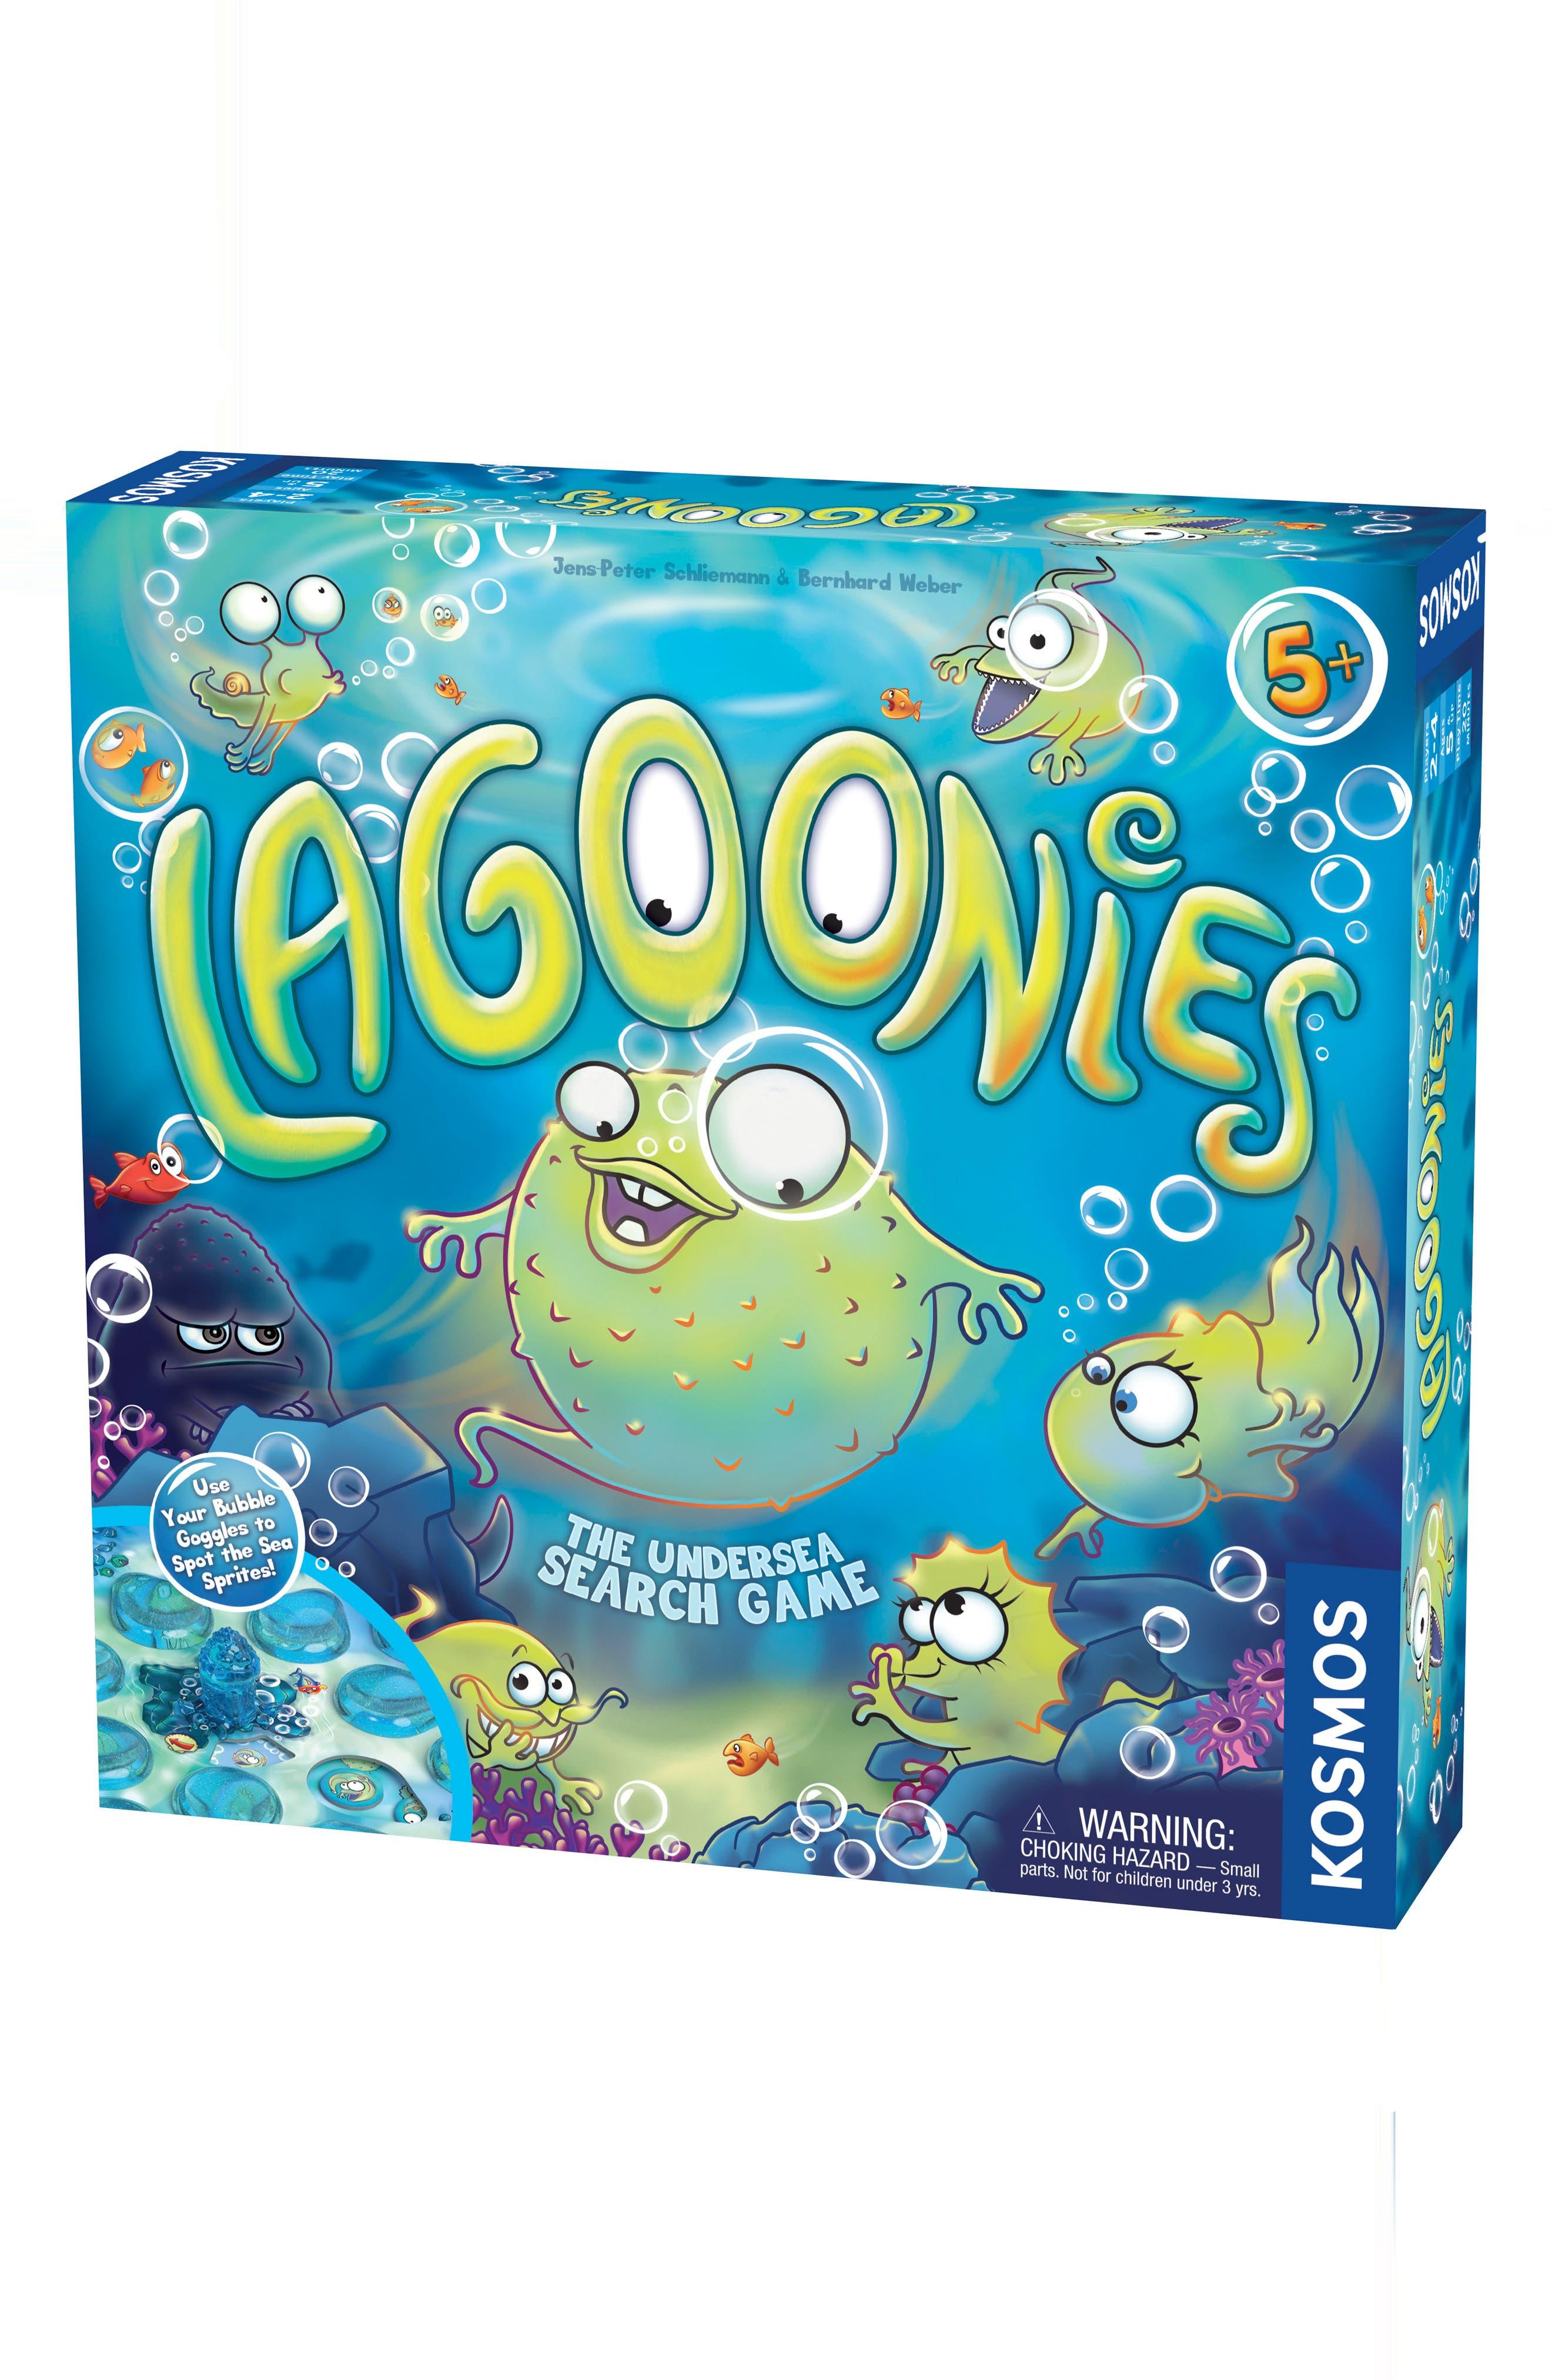 Thames & Kosmos Lagoonies Board Game